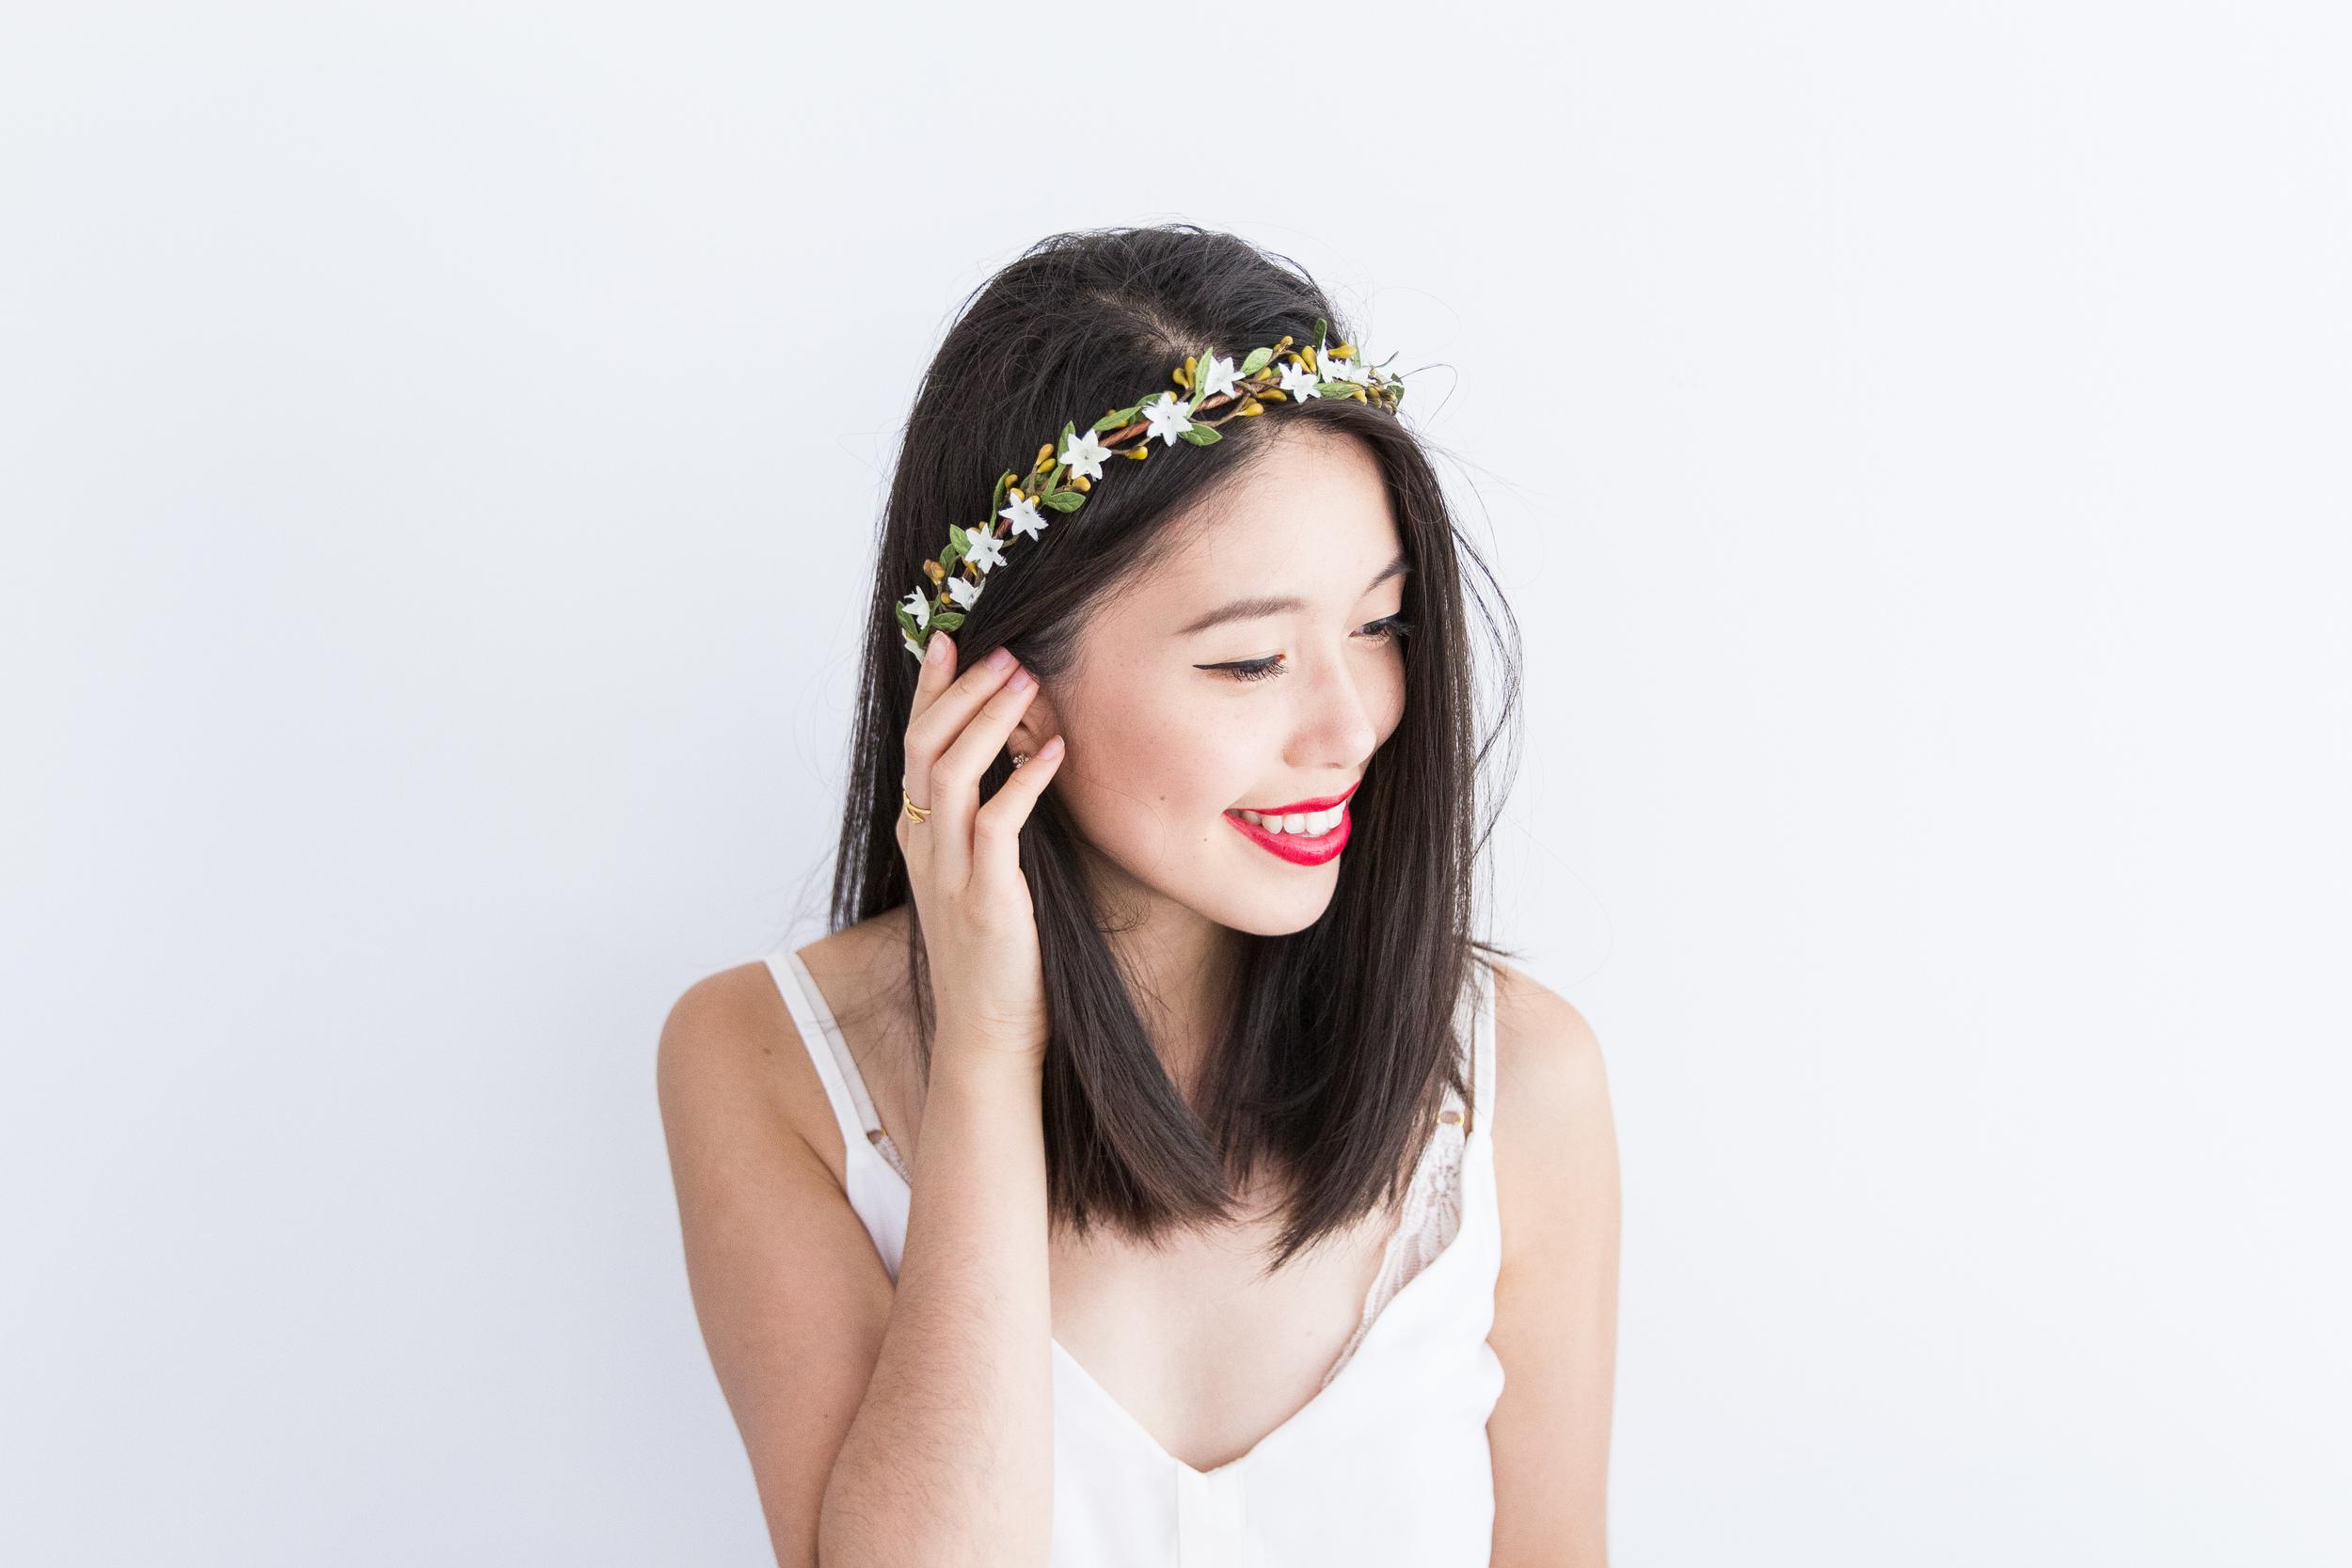 k is for kani floral headpieces bridal flower hair wreaths wedding-1.jpg